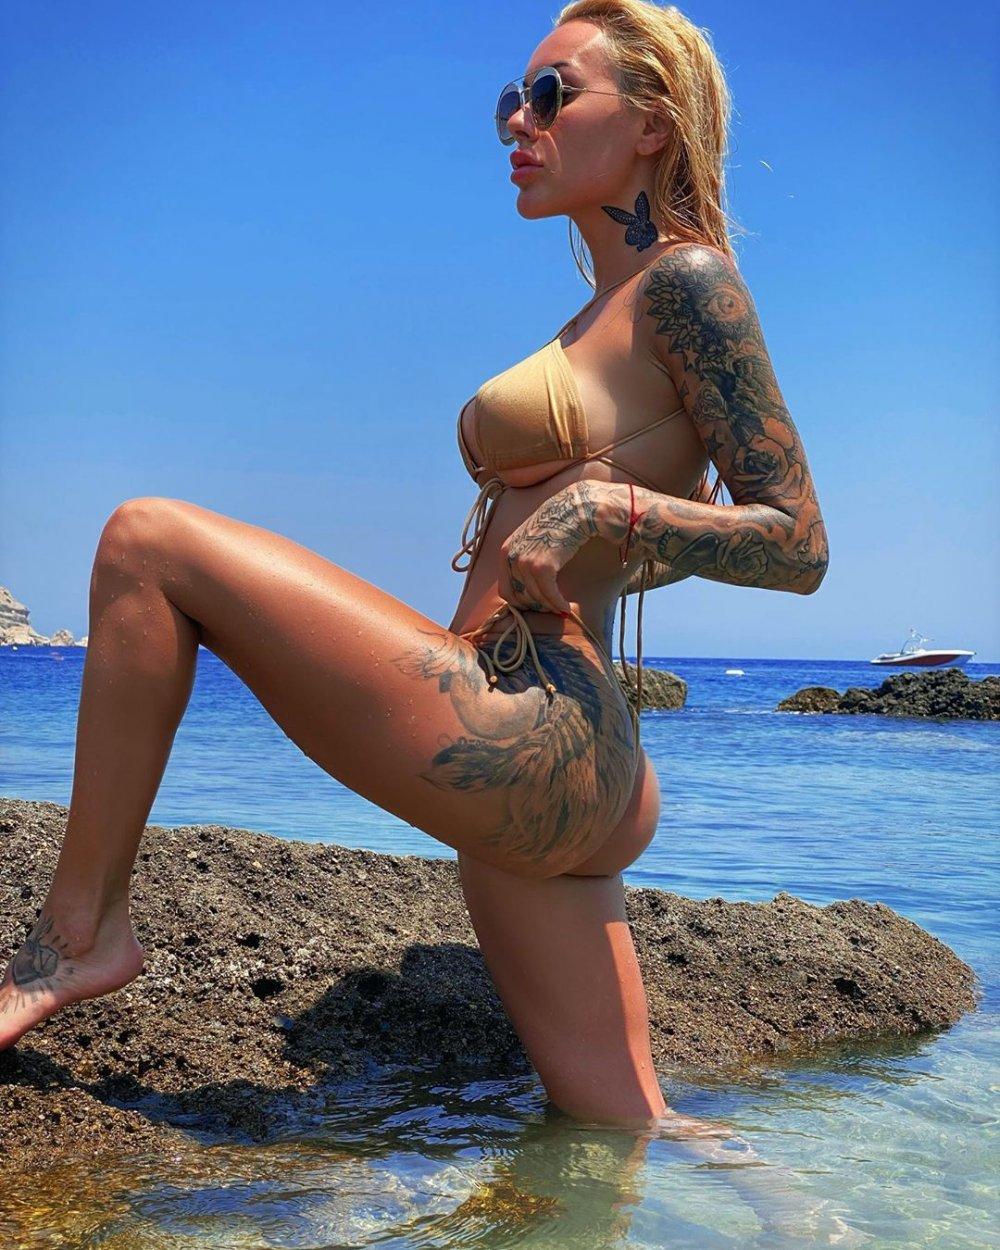 irina moroziuk bikini